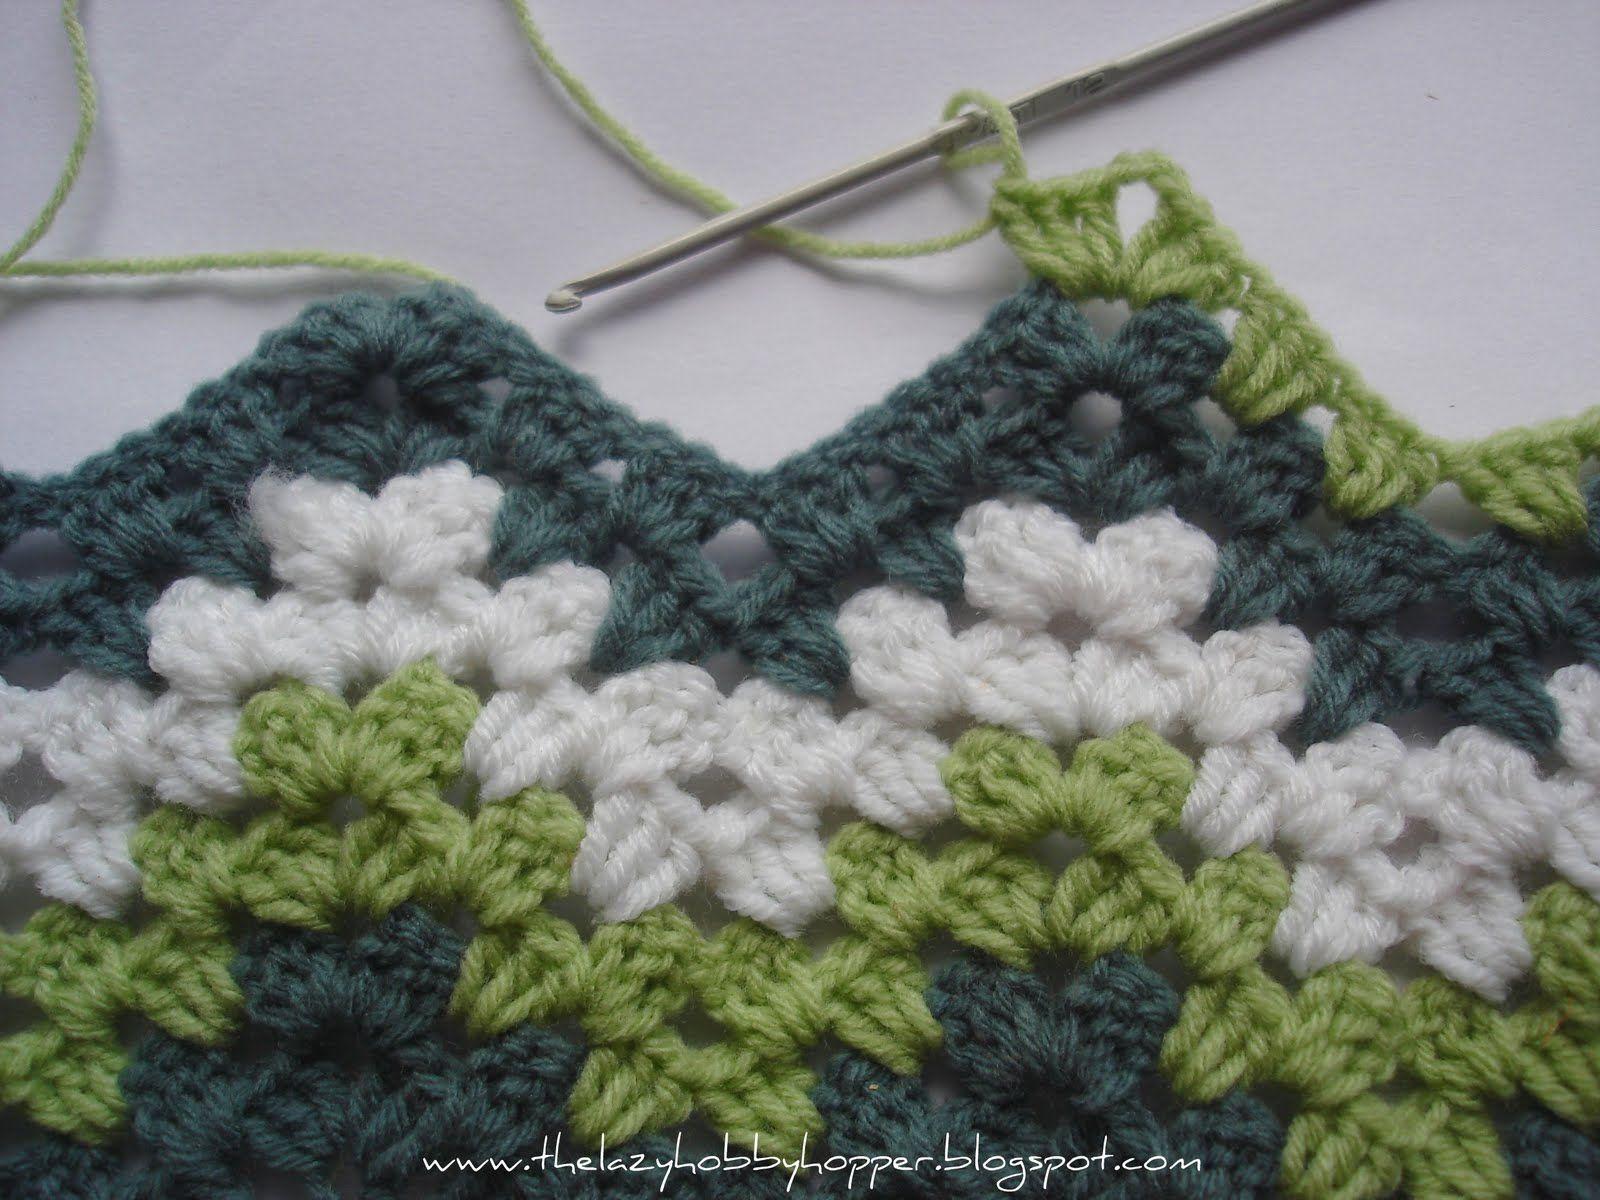 Crochet granny ripple crochet pinterest crochet granny crochet granny ripple bankloansurffo Images